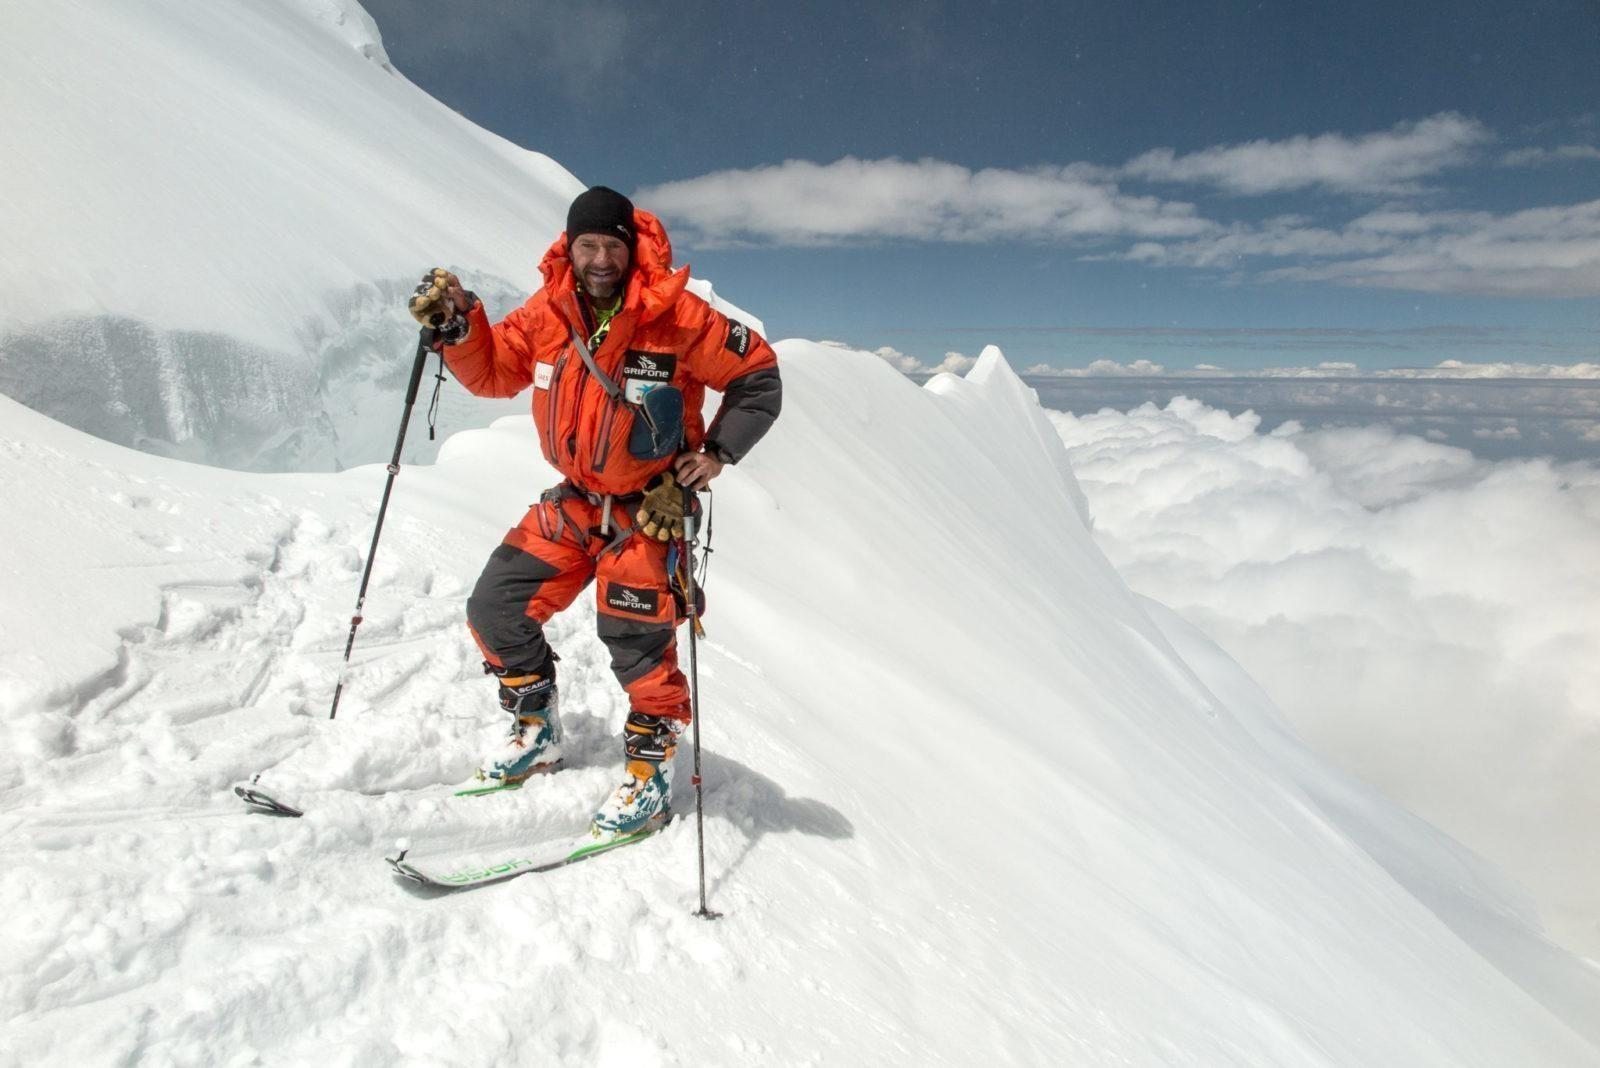 Course du ski de montagne Ferran Latorre